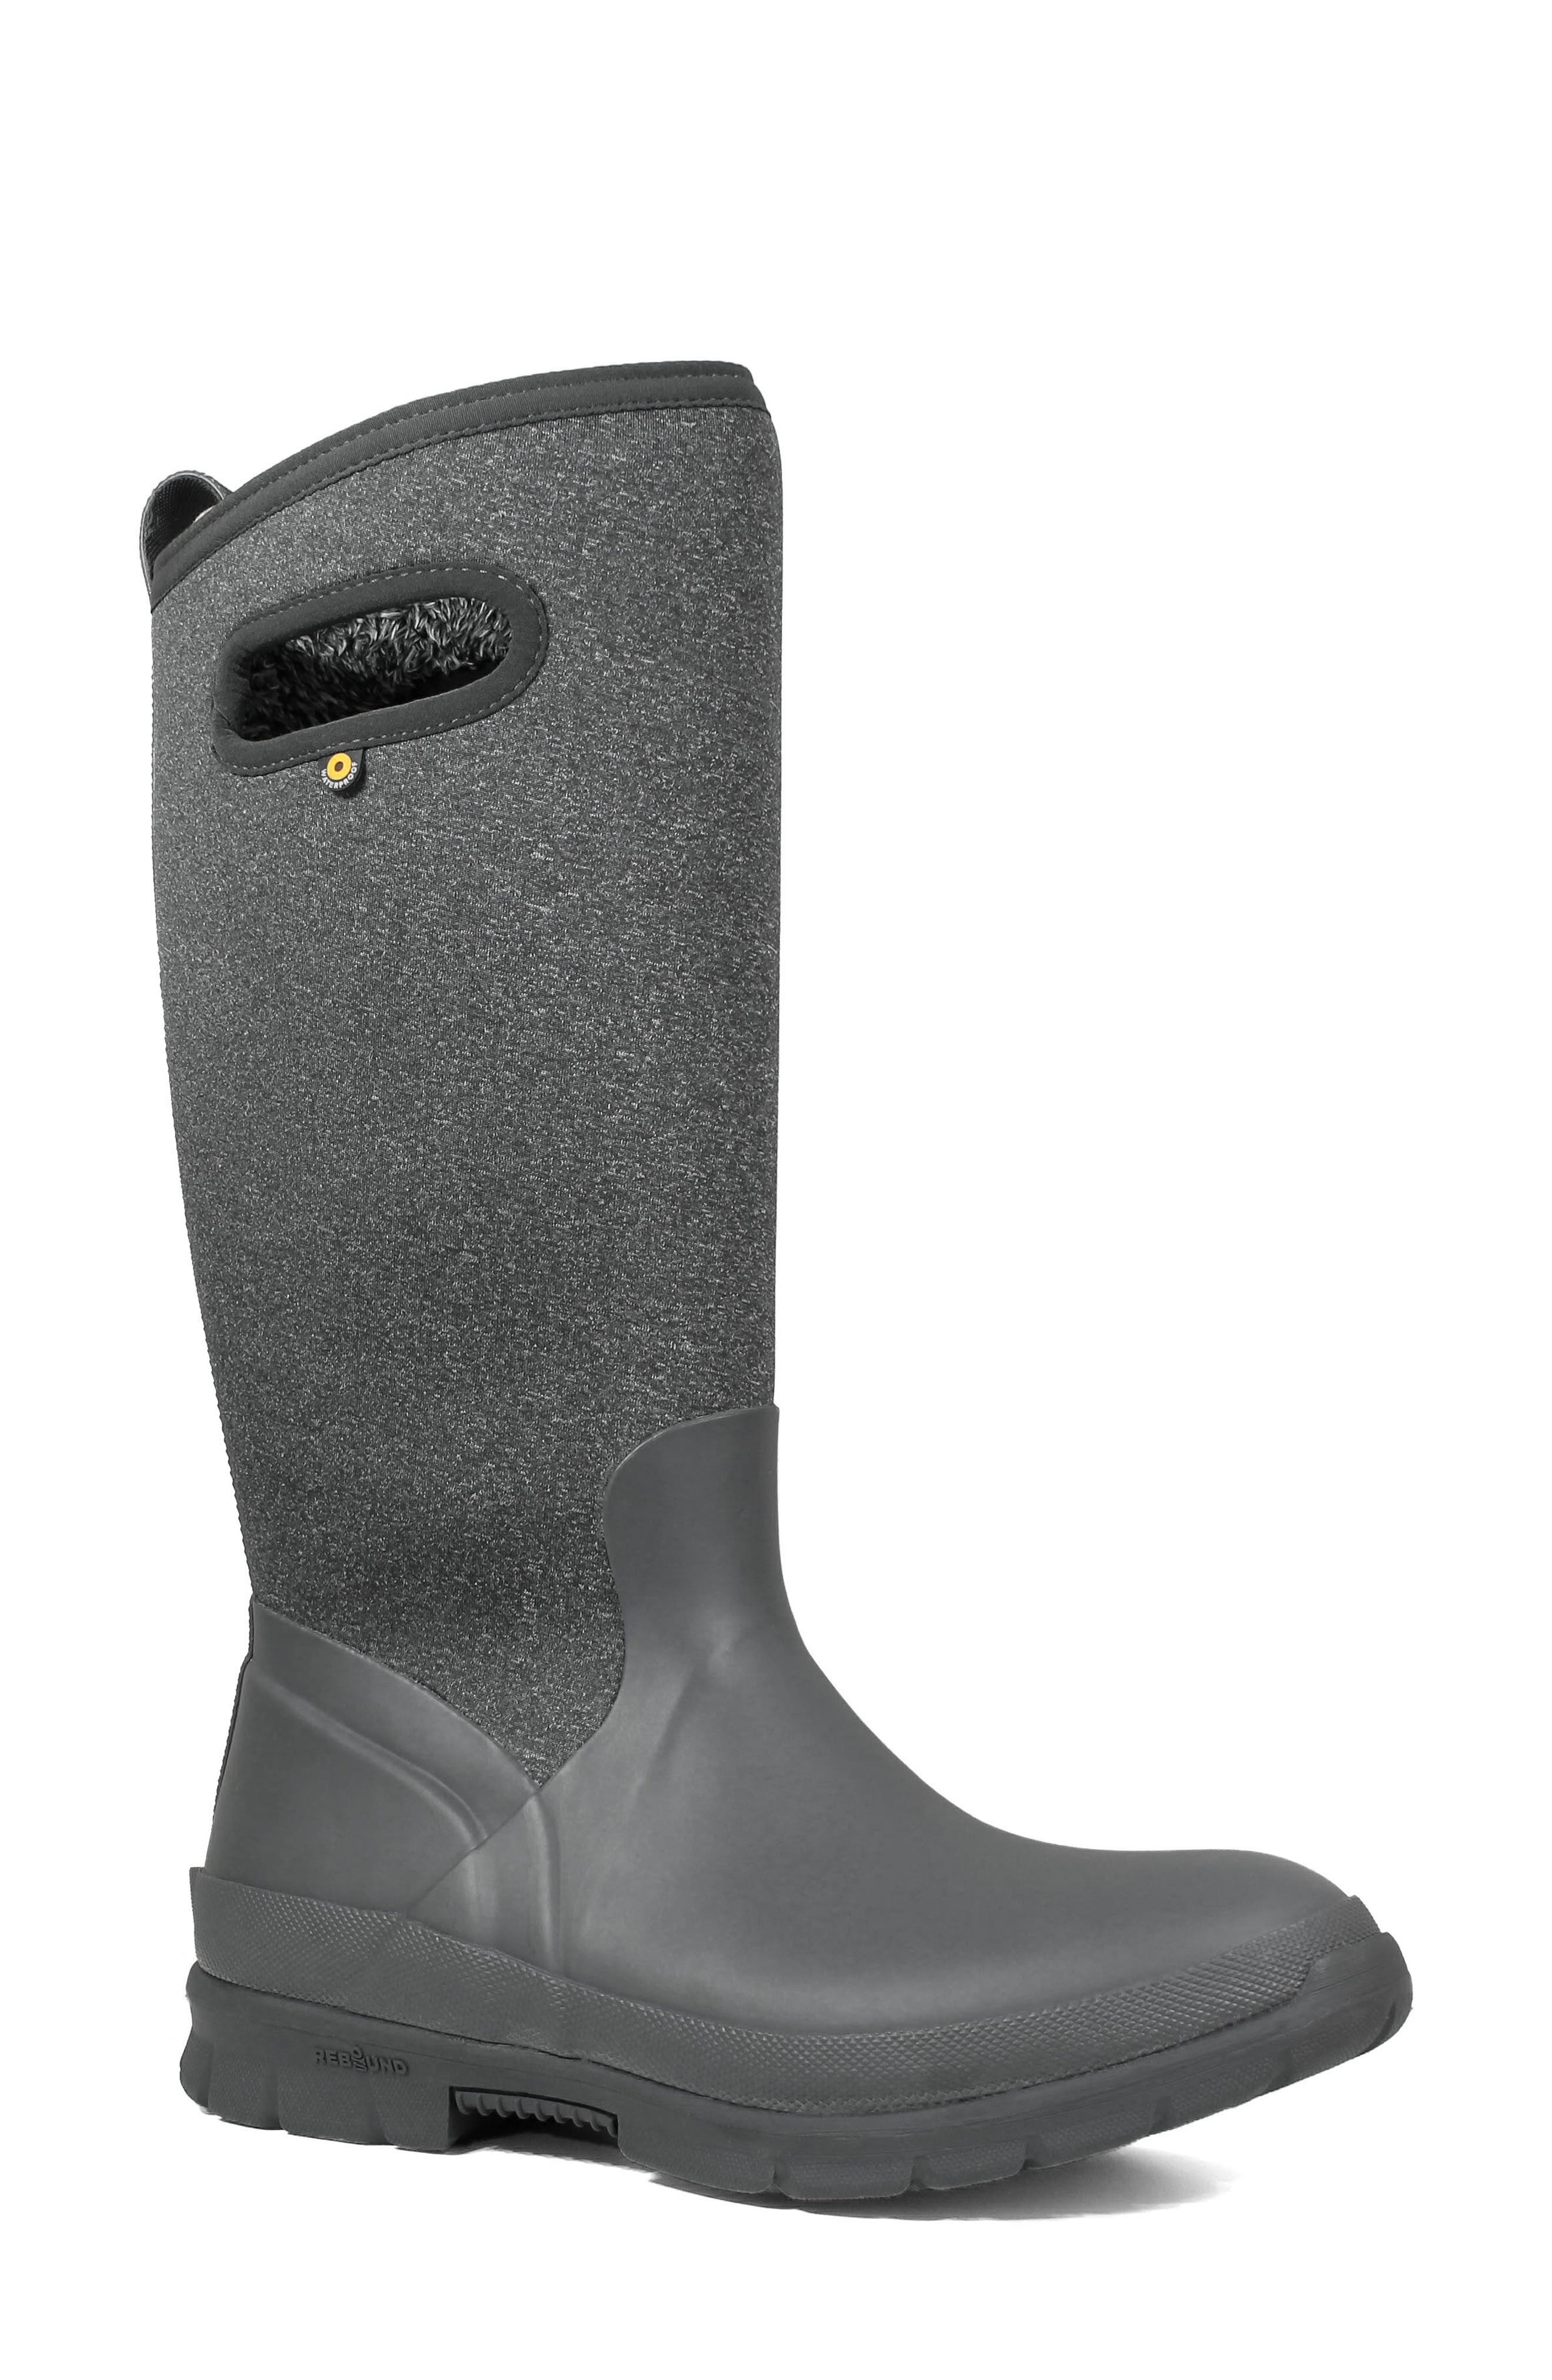 Crandall Waterproof Tall Boot,                         Main,                         color, DARK GREY